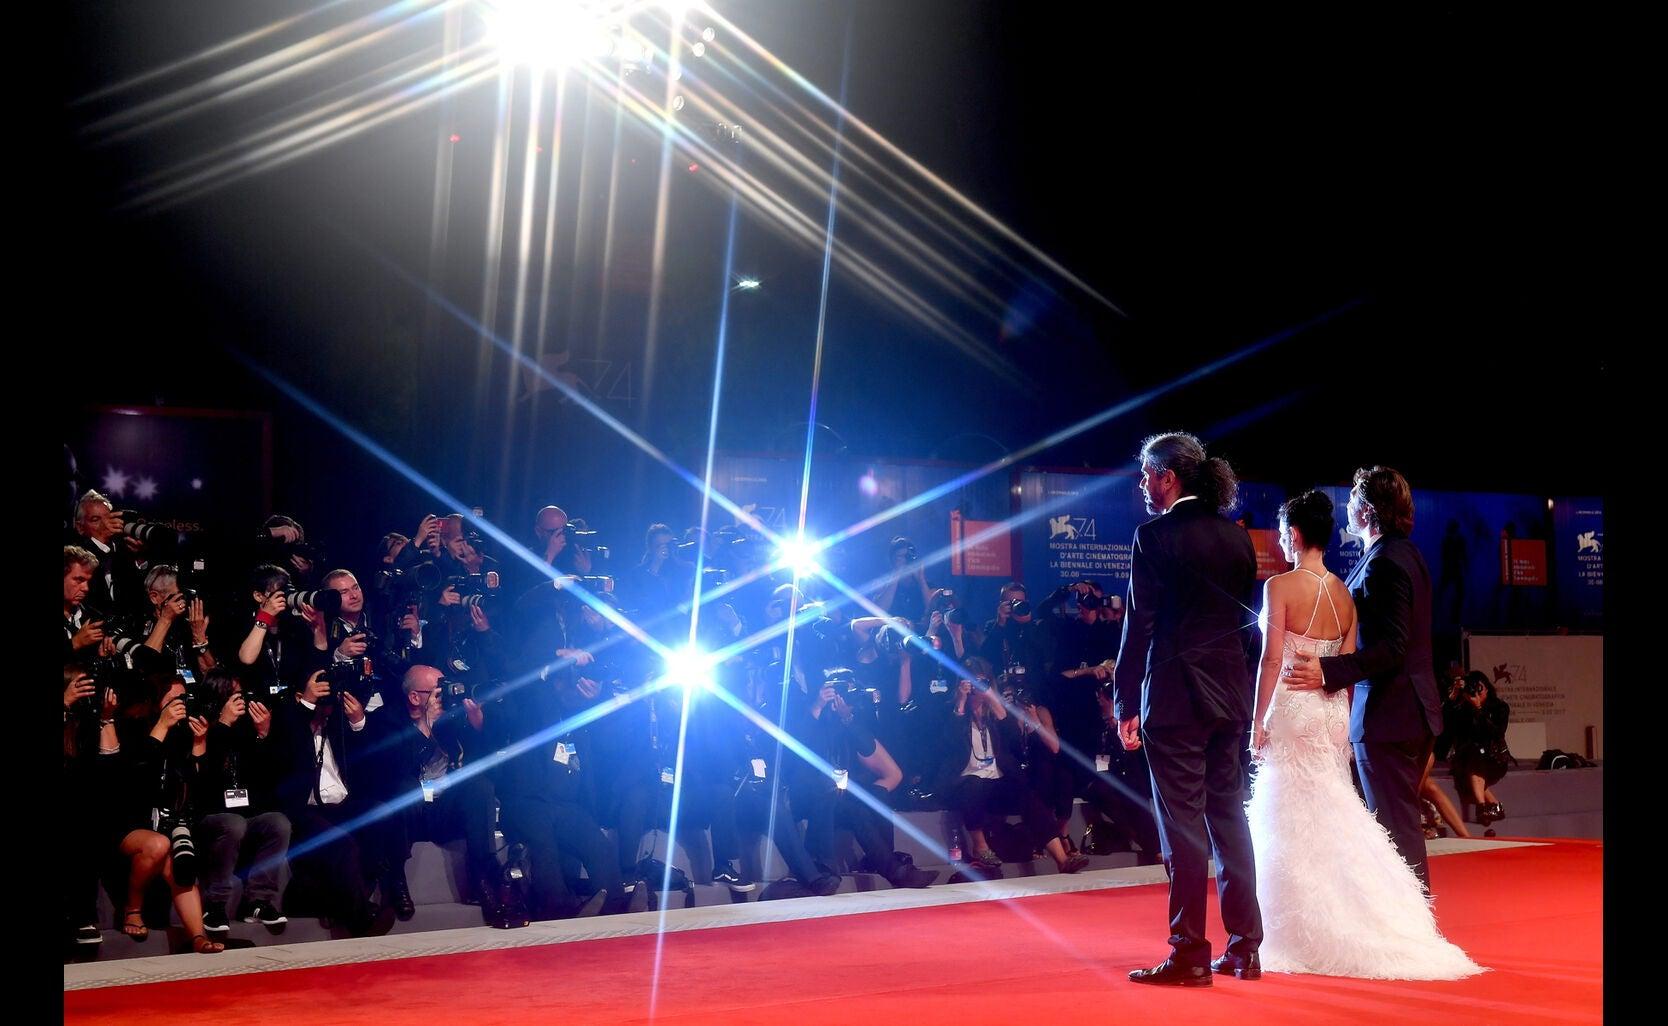 Javier Bardem, Penelope Cruz and Fernando Leon de Aranoa